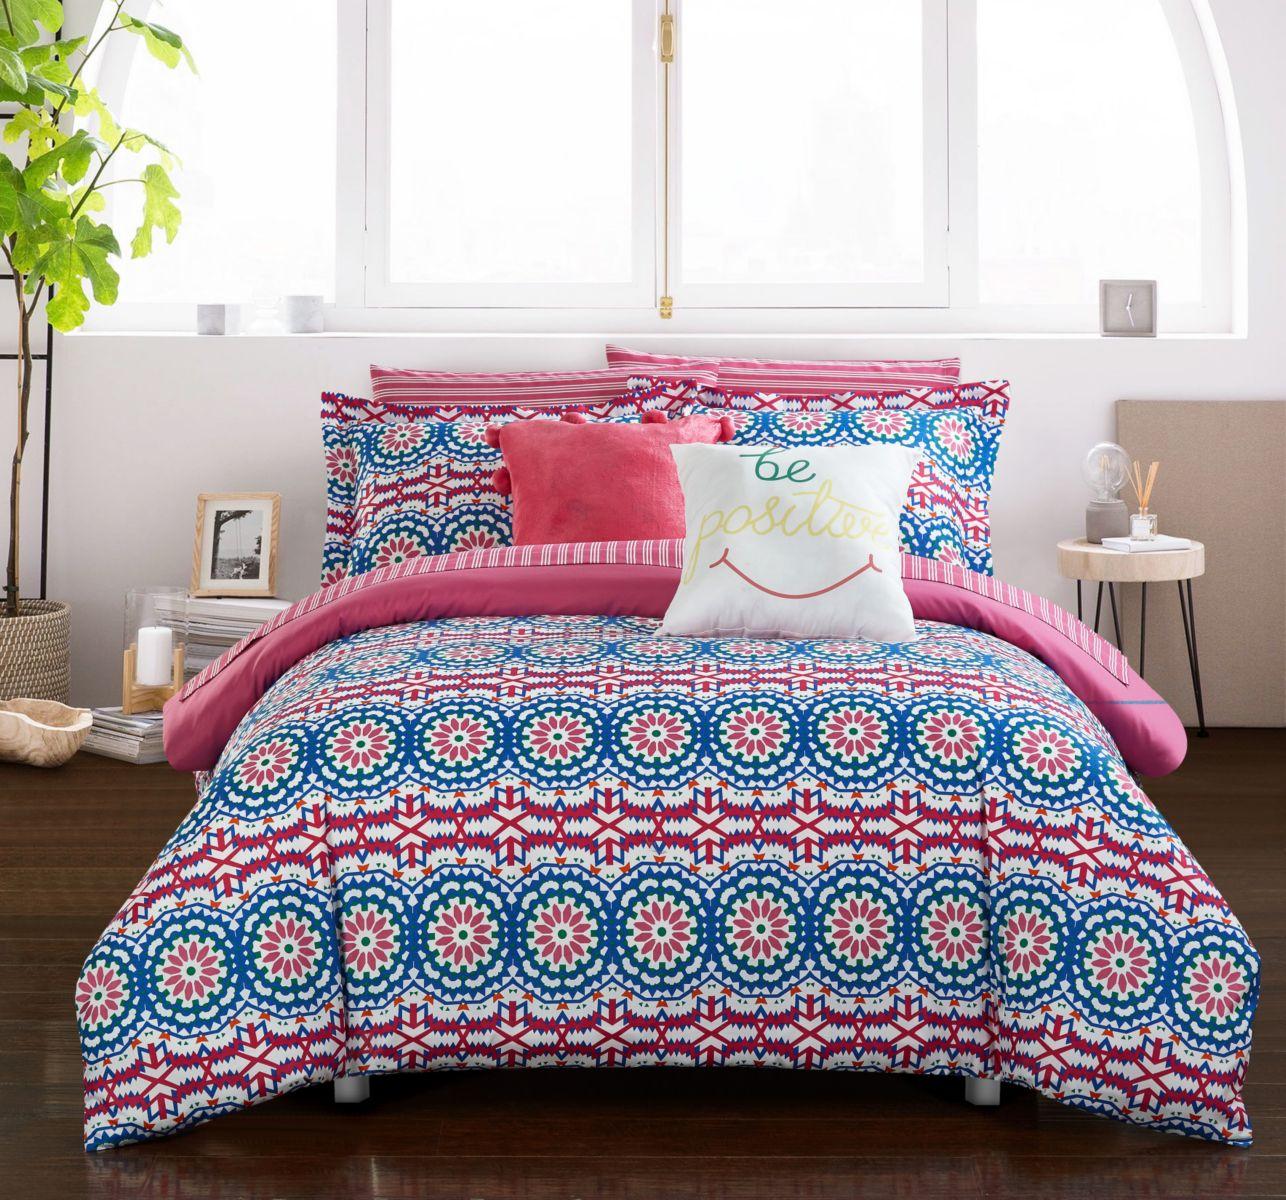 Chic Home Jojo 9-Pc Comforter Sets